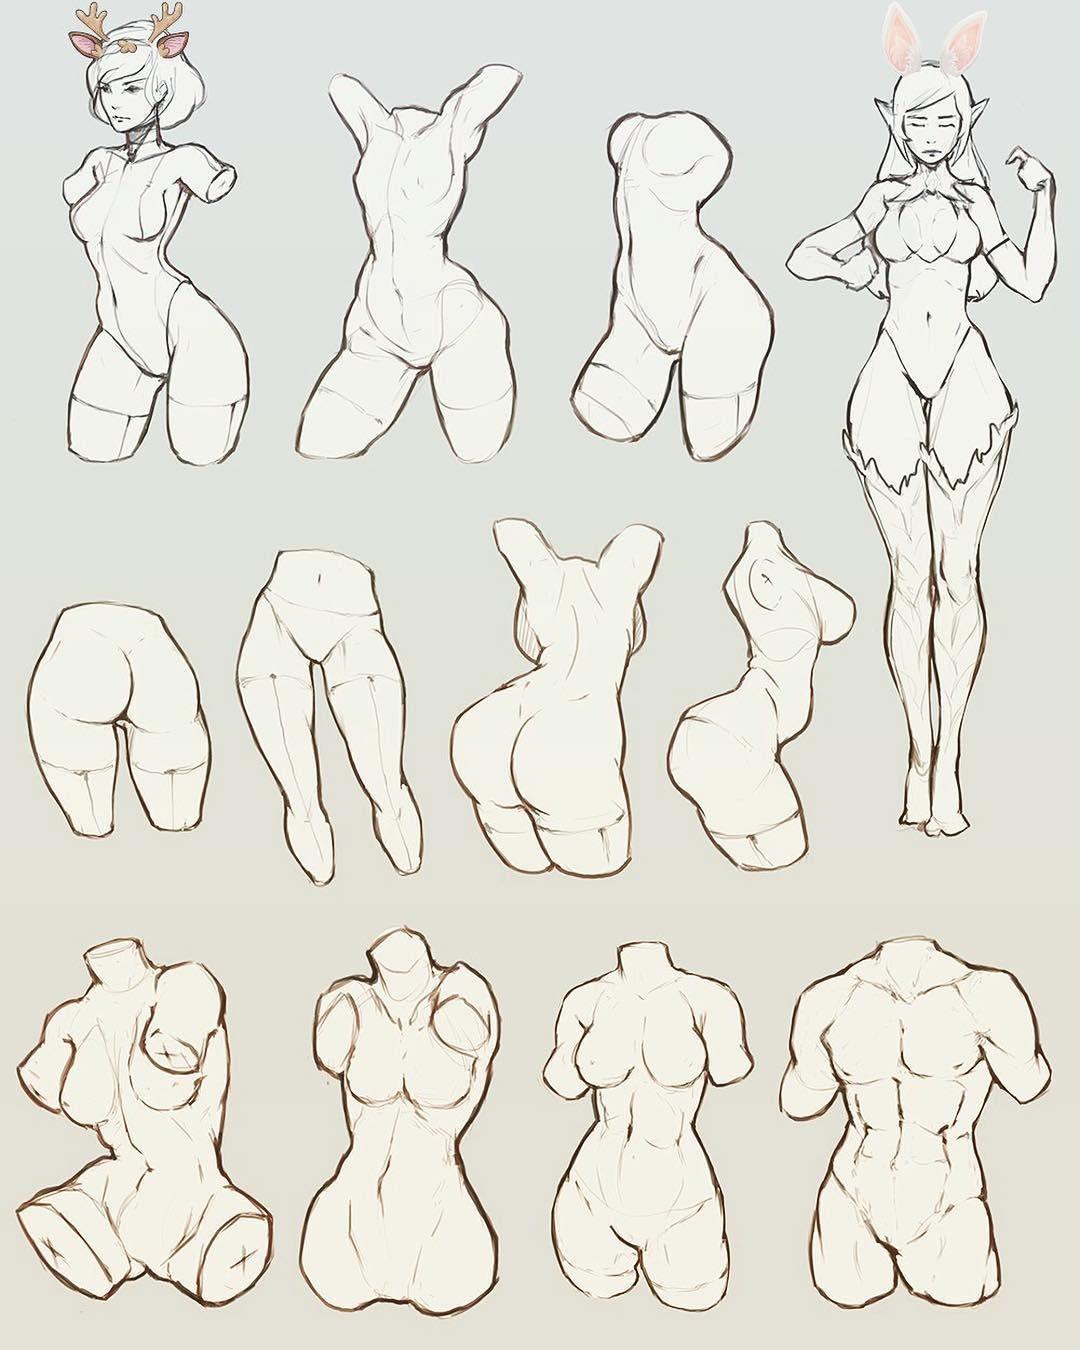 study #art #draw #female #body #sketch #reference #wip #girl #line ...